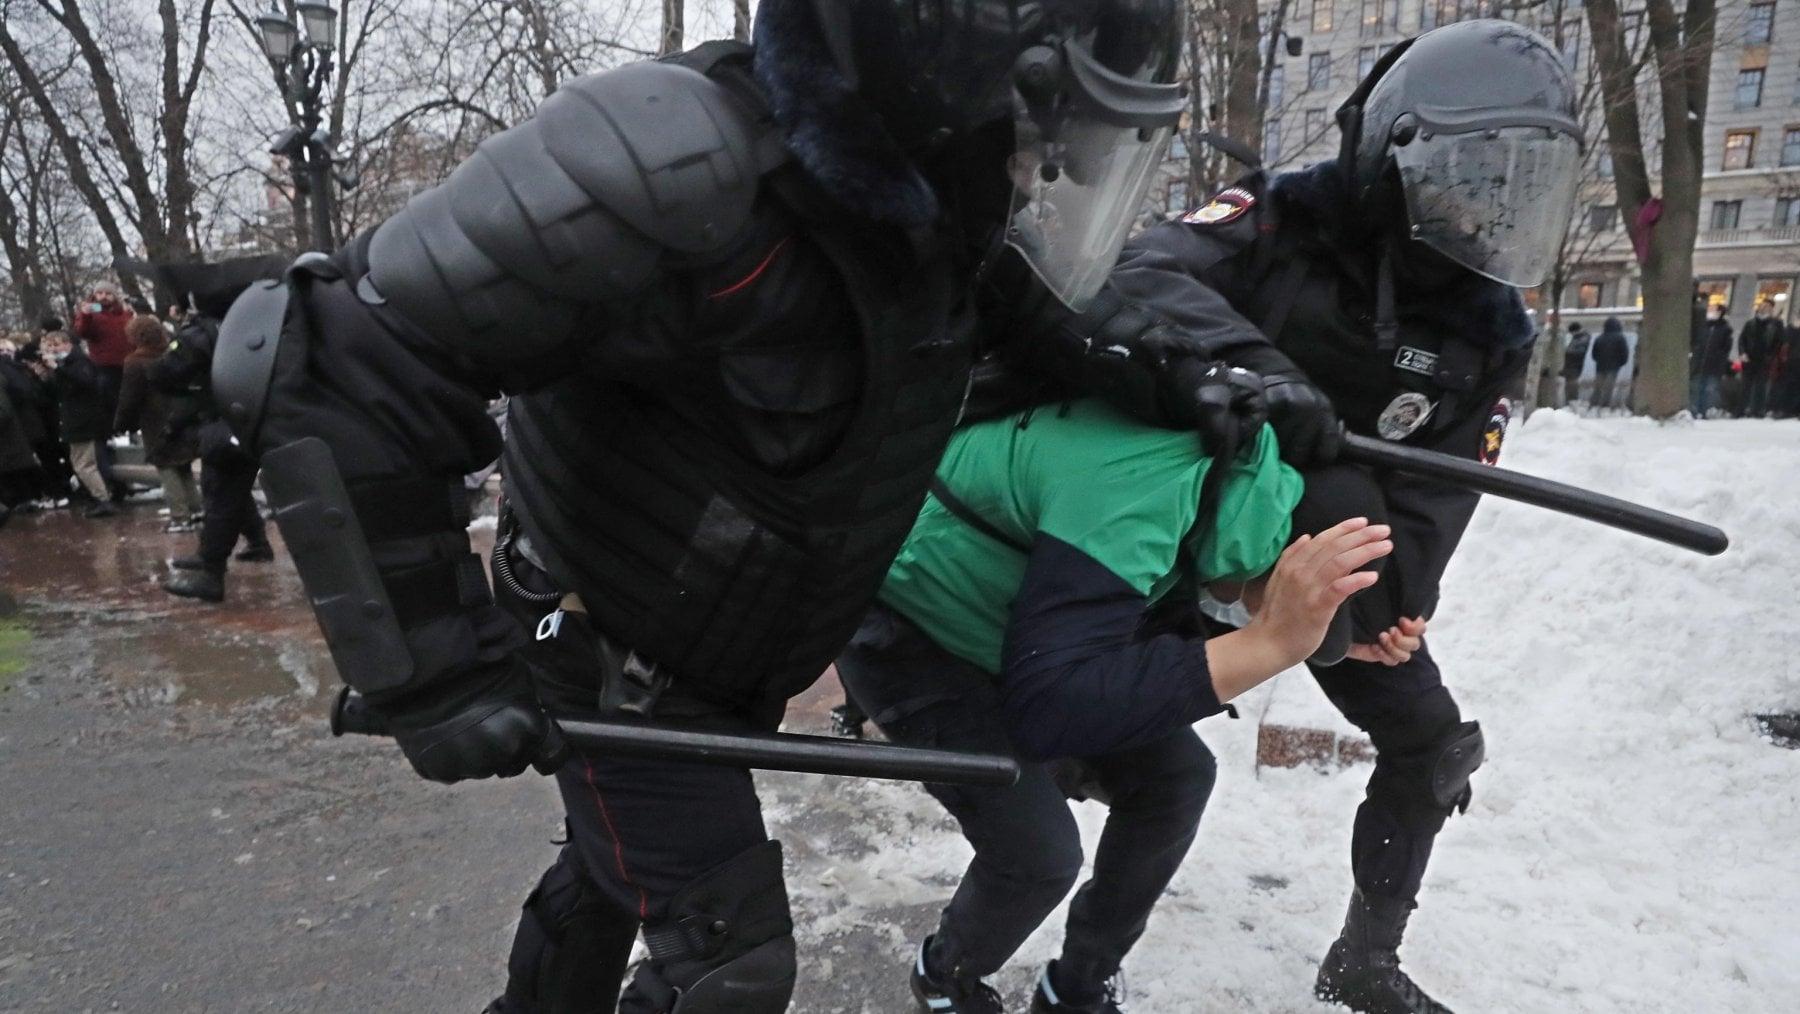 221816524 799d2b1f 0e9e 496f 8368 9260b9b1a396 - Nuove manifestazioni in Russia: record di oltre 5.100 arresti in 90 città